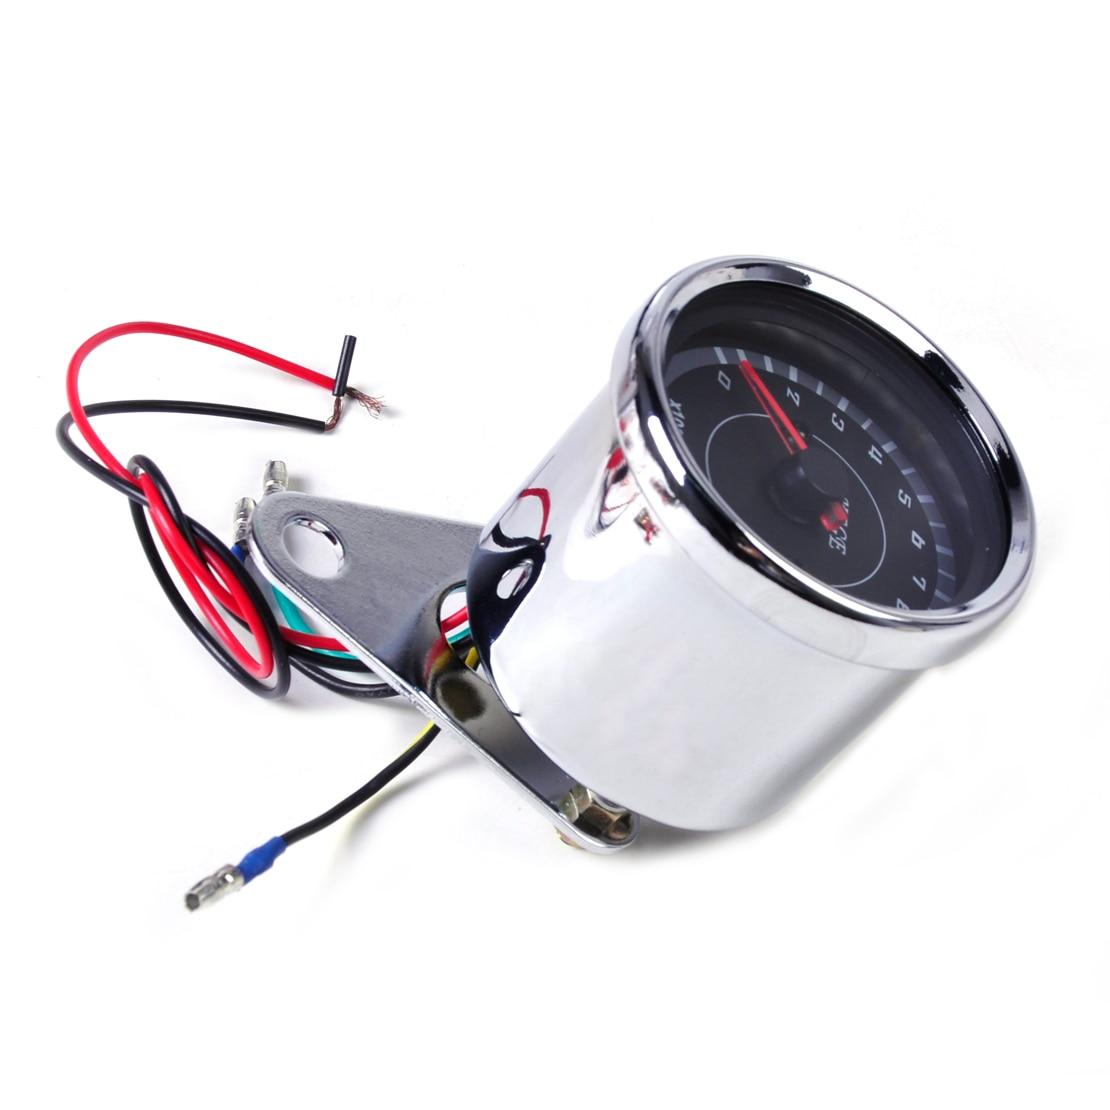 dwcx novo universal chrome led 13000 rpm 04